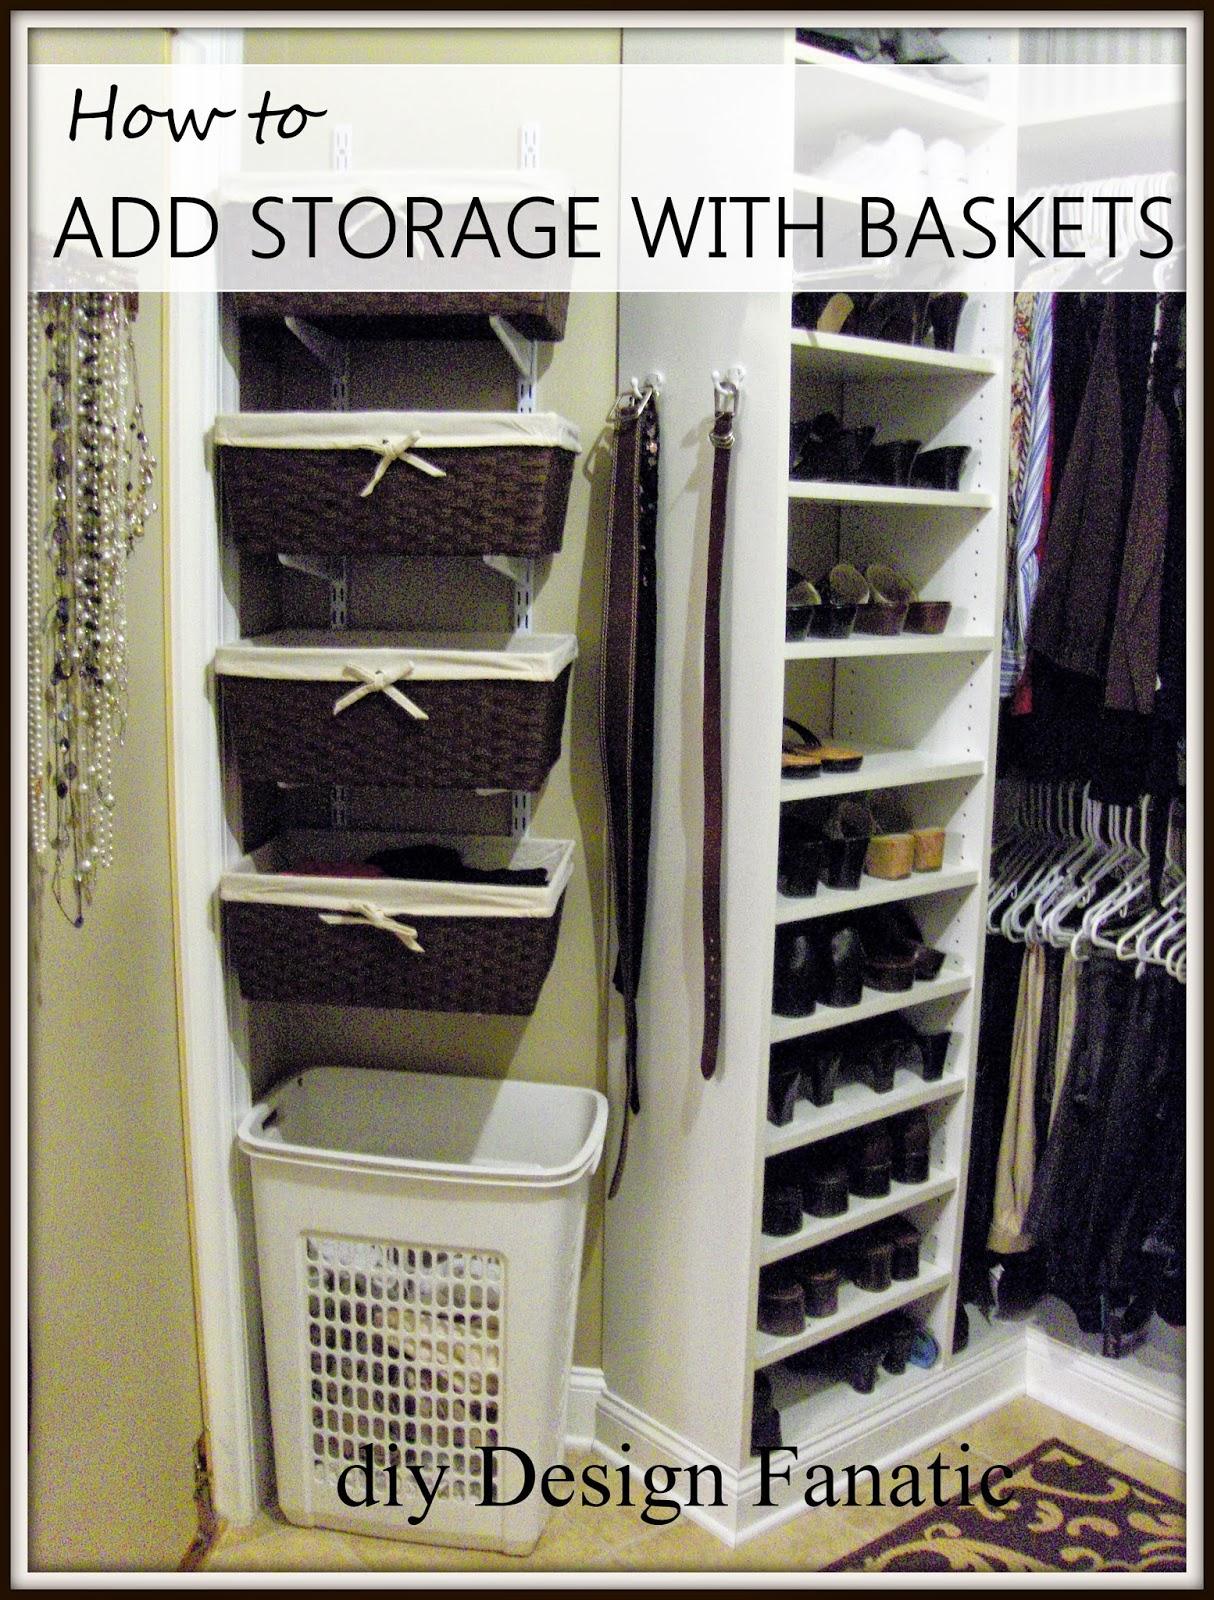 Attirant Track Bracket, Baskets, Master Closet, Organization, Storage Shelves, Add  Space To